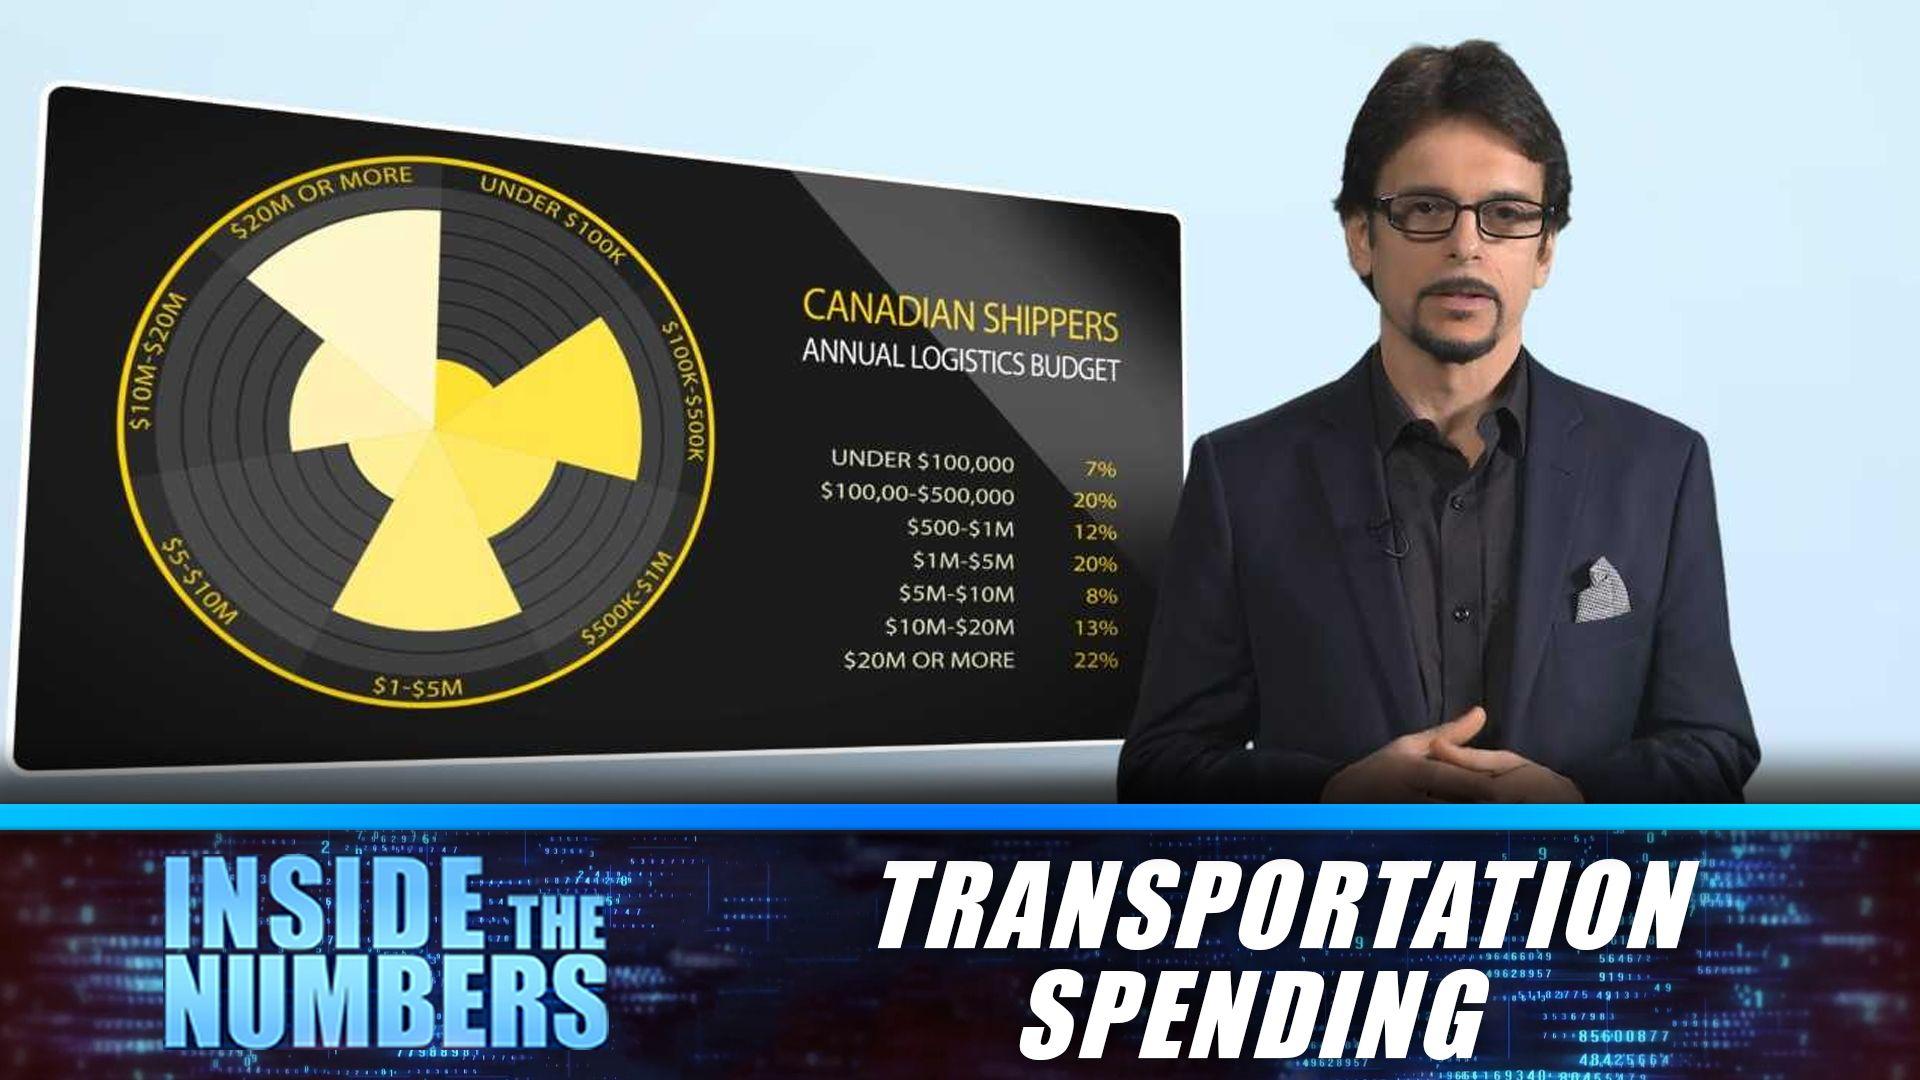 Icymi insidethenumbers season 3 ep 5 transportation